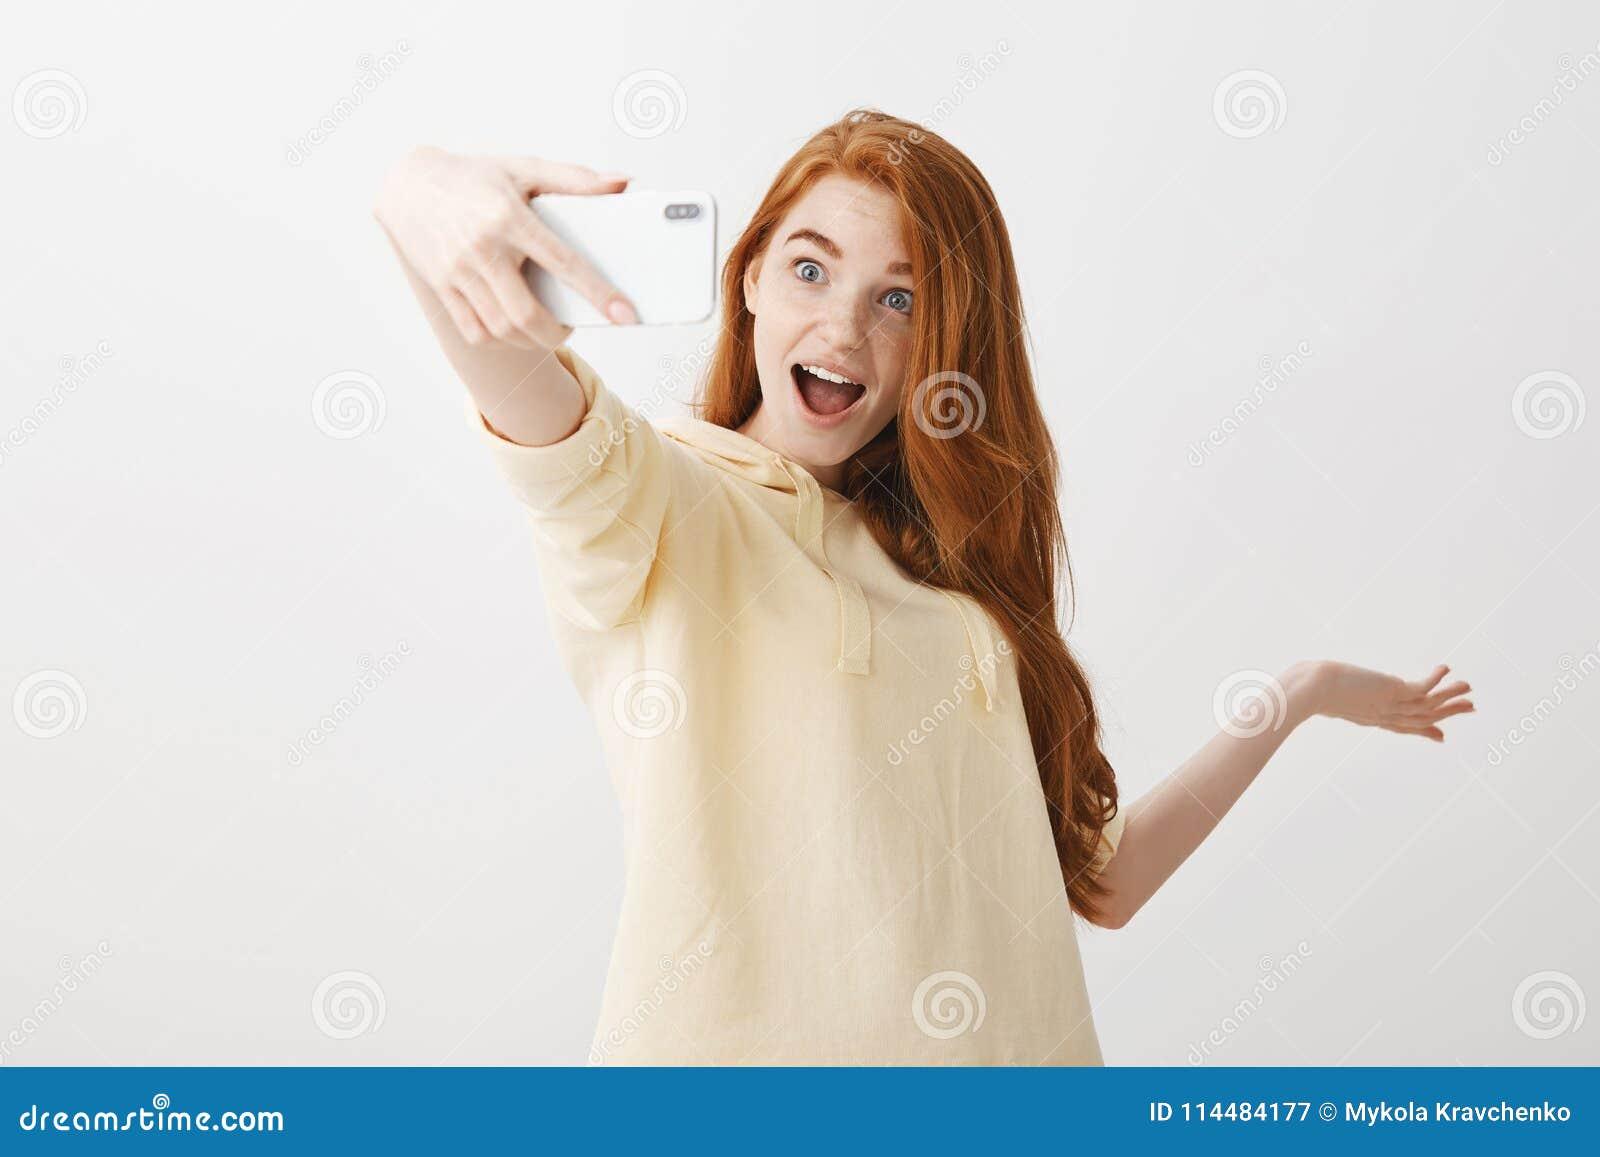 Online girlfriend making site